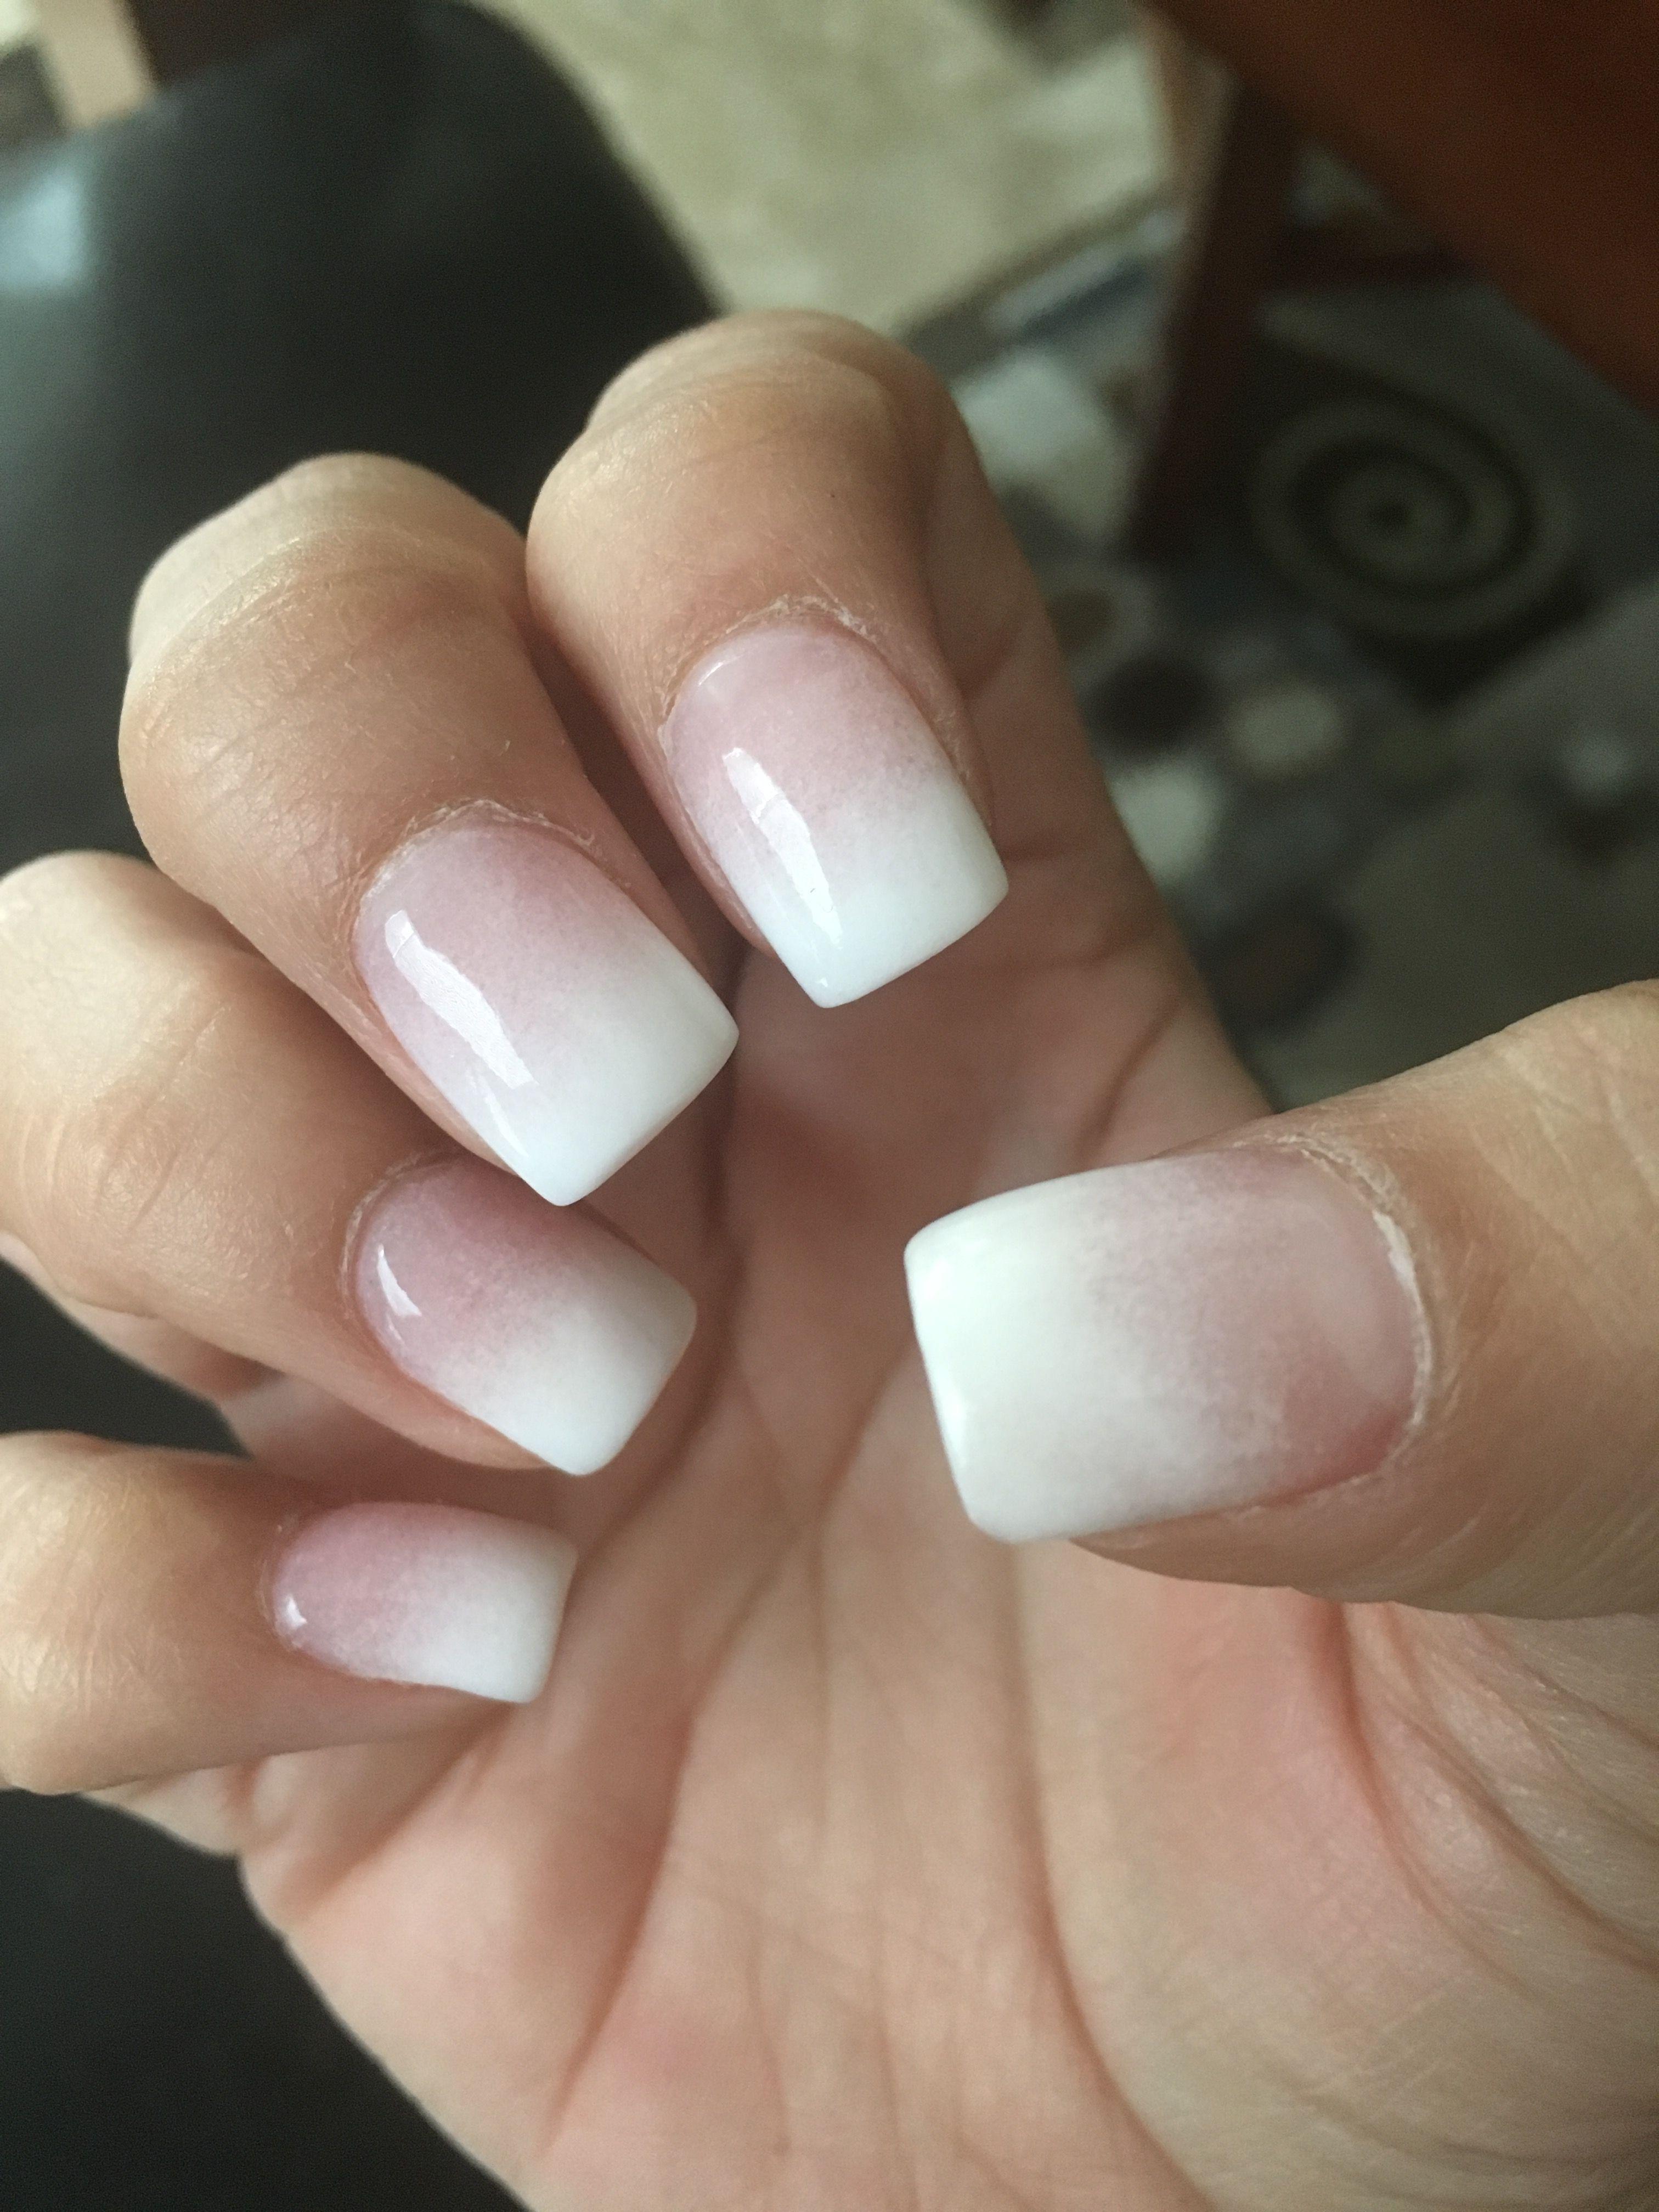 Pink And White Ombre Nexgen Nails Nails Pinterest Manicure Summernails With Images Nexgen Nails Nexgen Nails Colors Pink Ombre Nails